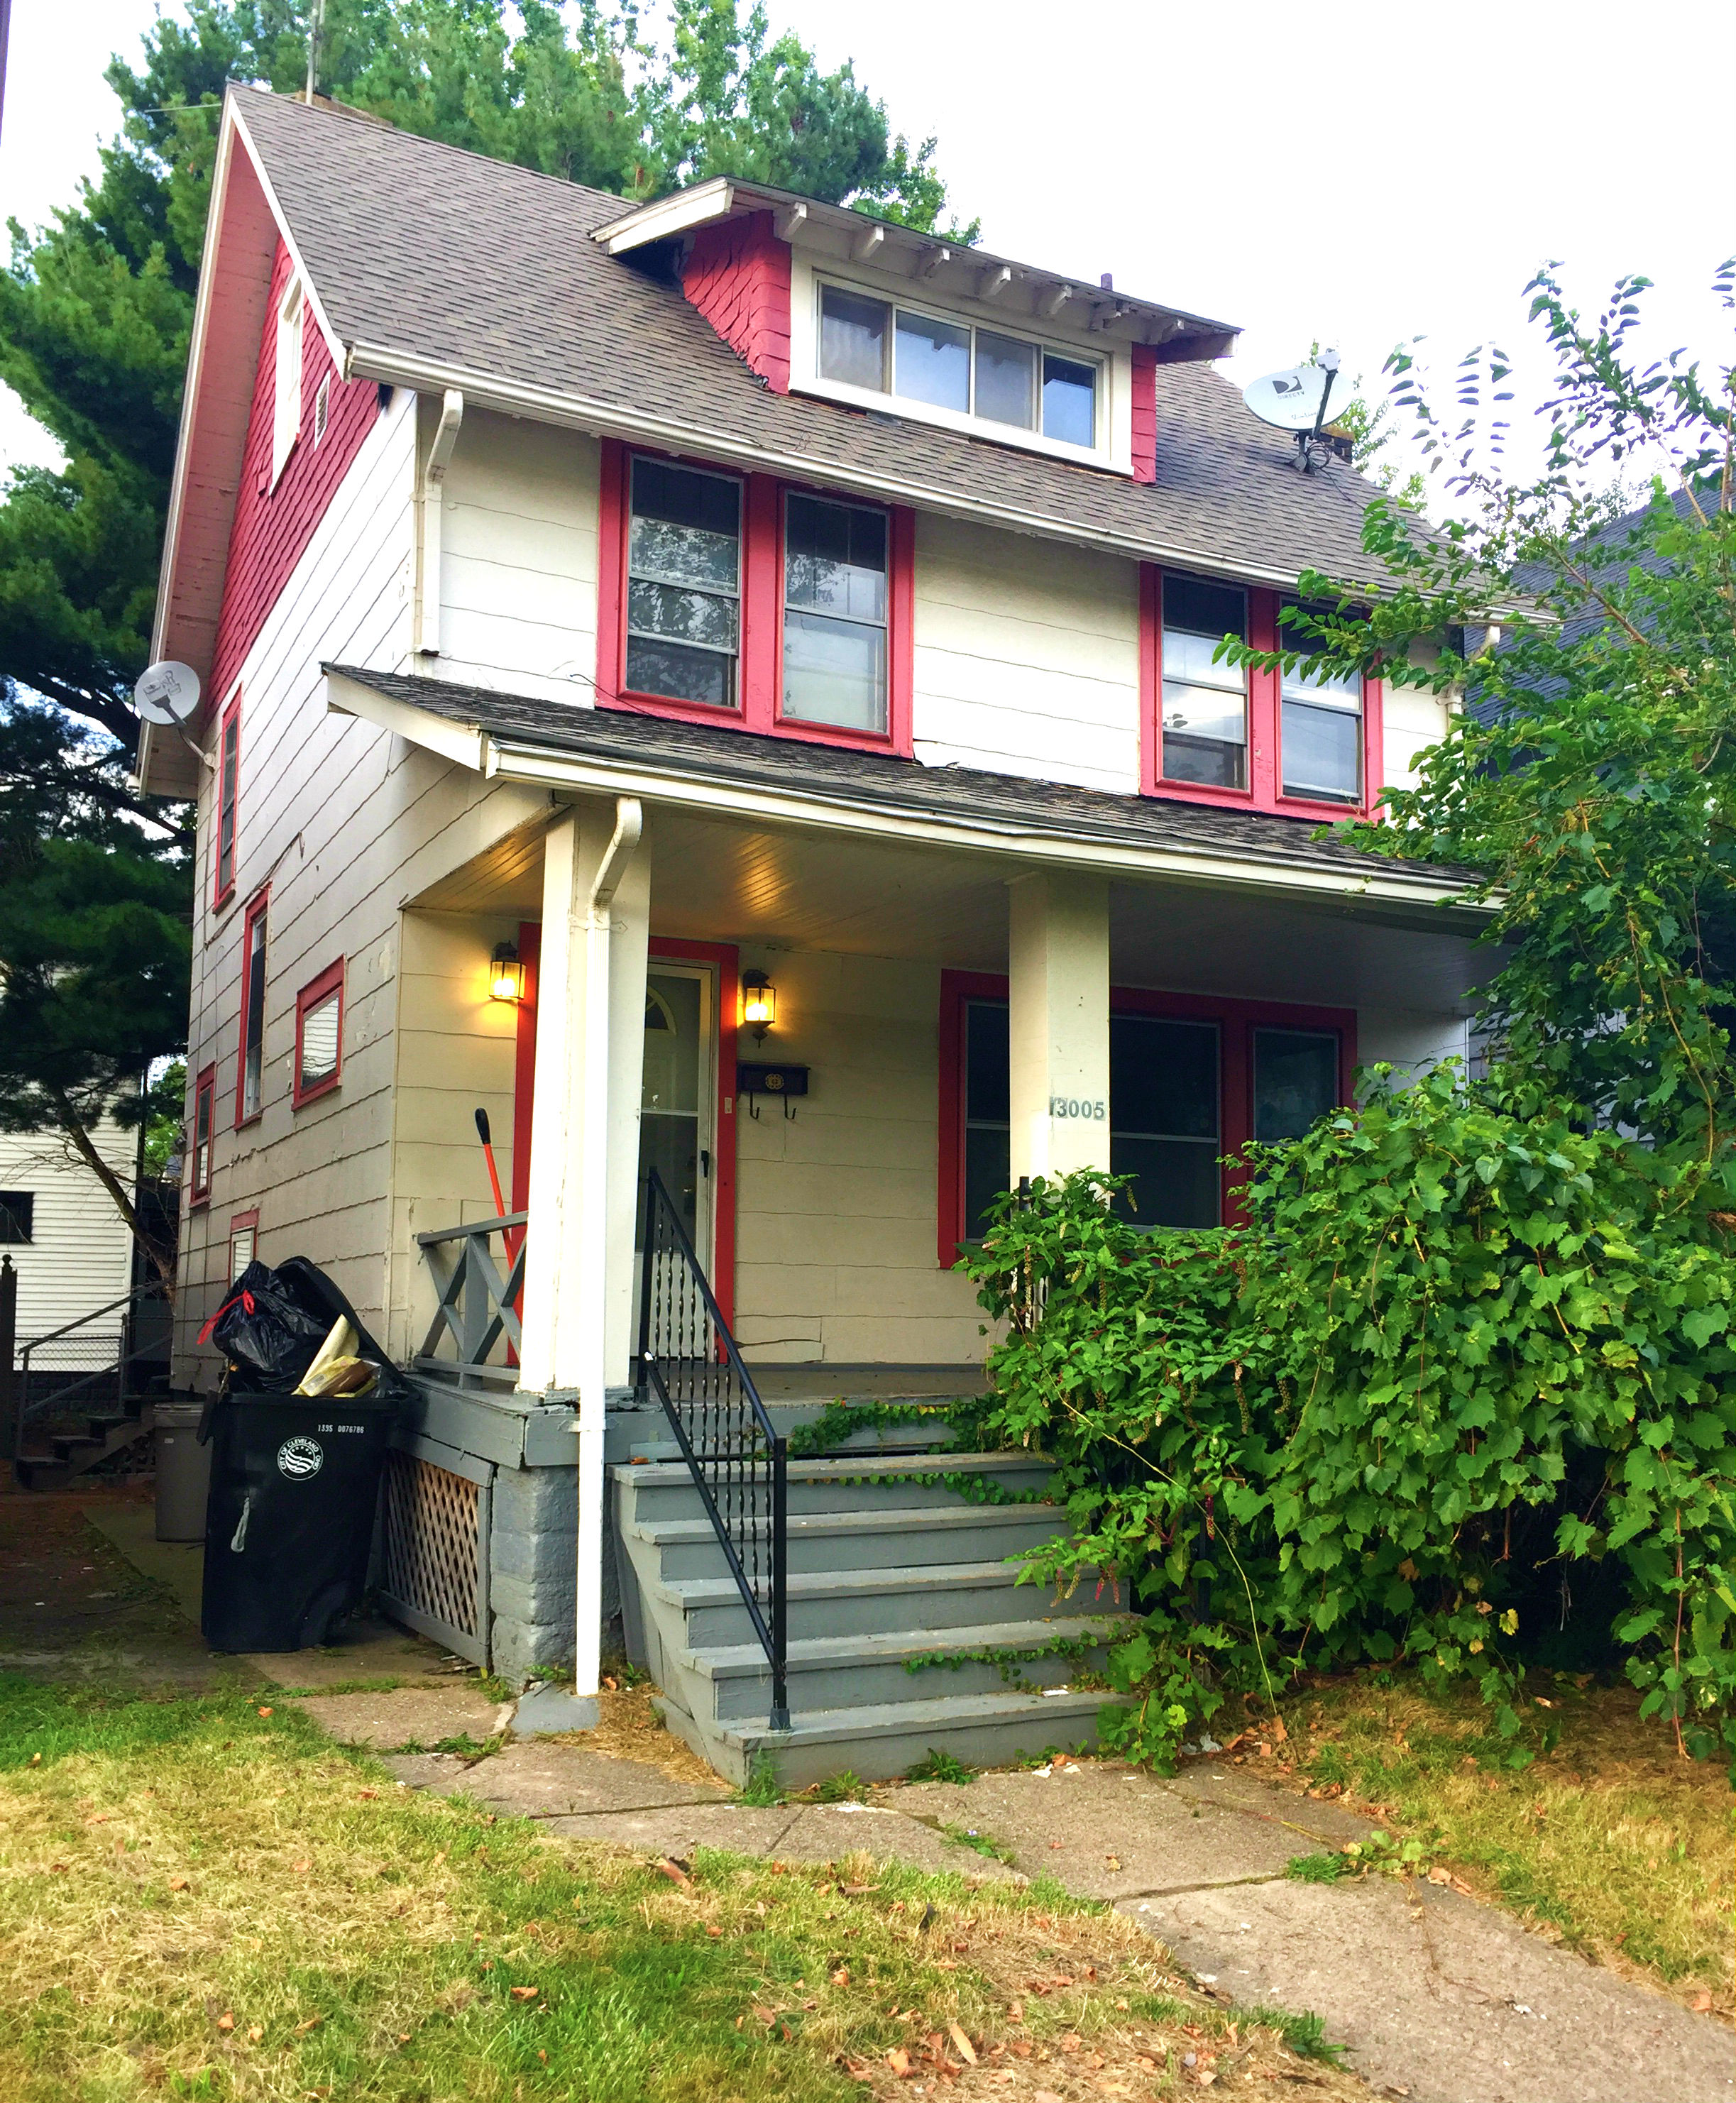 13005 Edmondton Ave., Cleveland | 3 bed 1 bath | 1,333 Sq. Ft. | $ 29,900